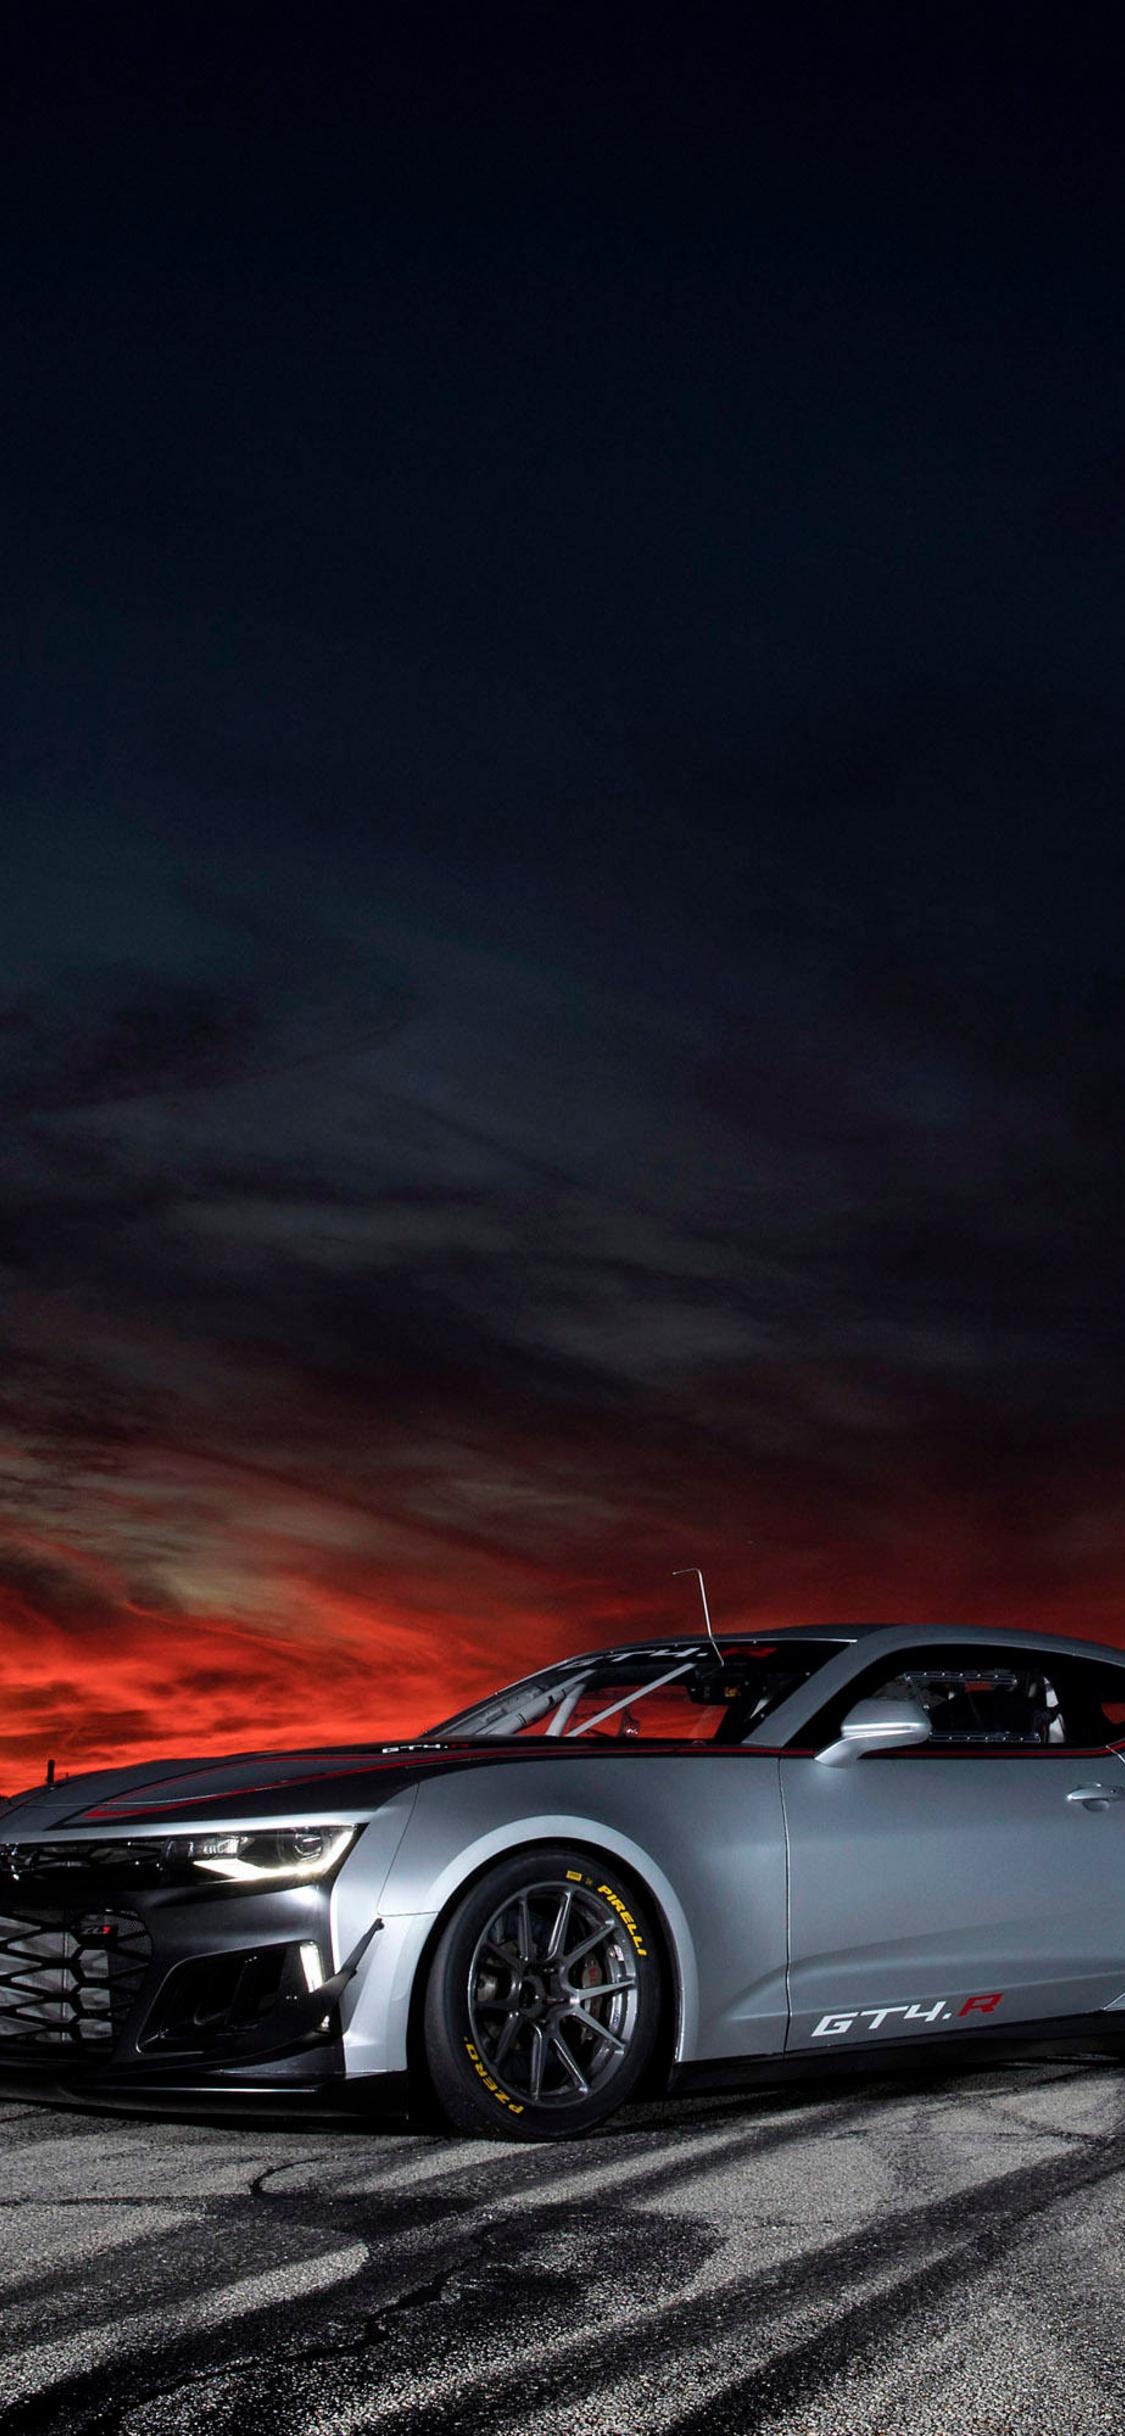 1125x2436 Chevrolet Camaro Zl1 1le Gt4 R 2017 Iphone Xs Iphone 10